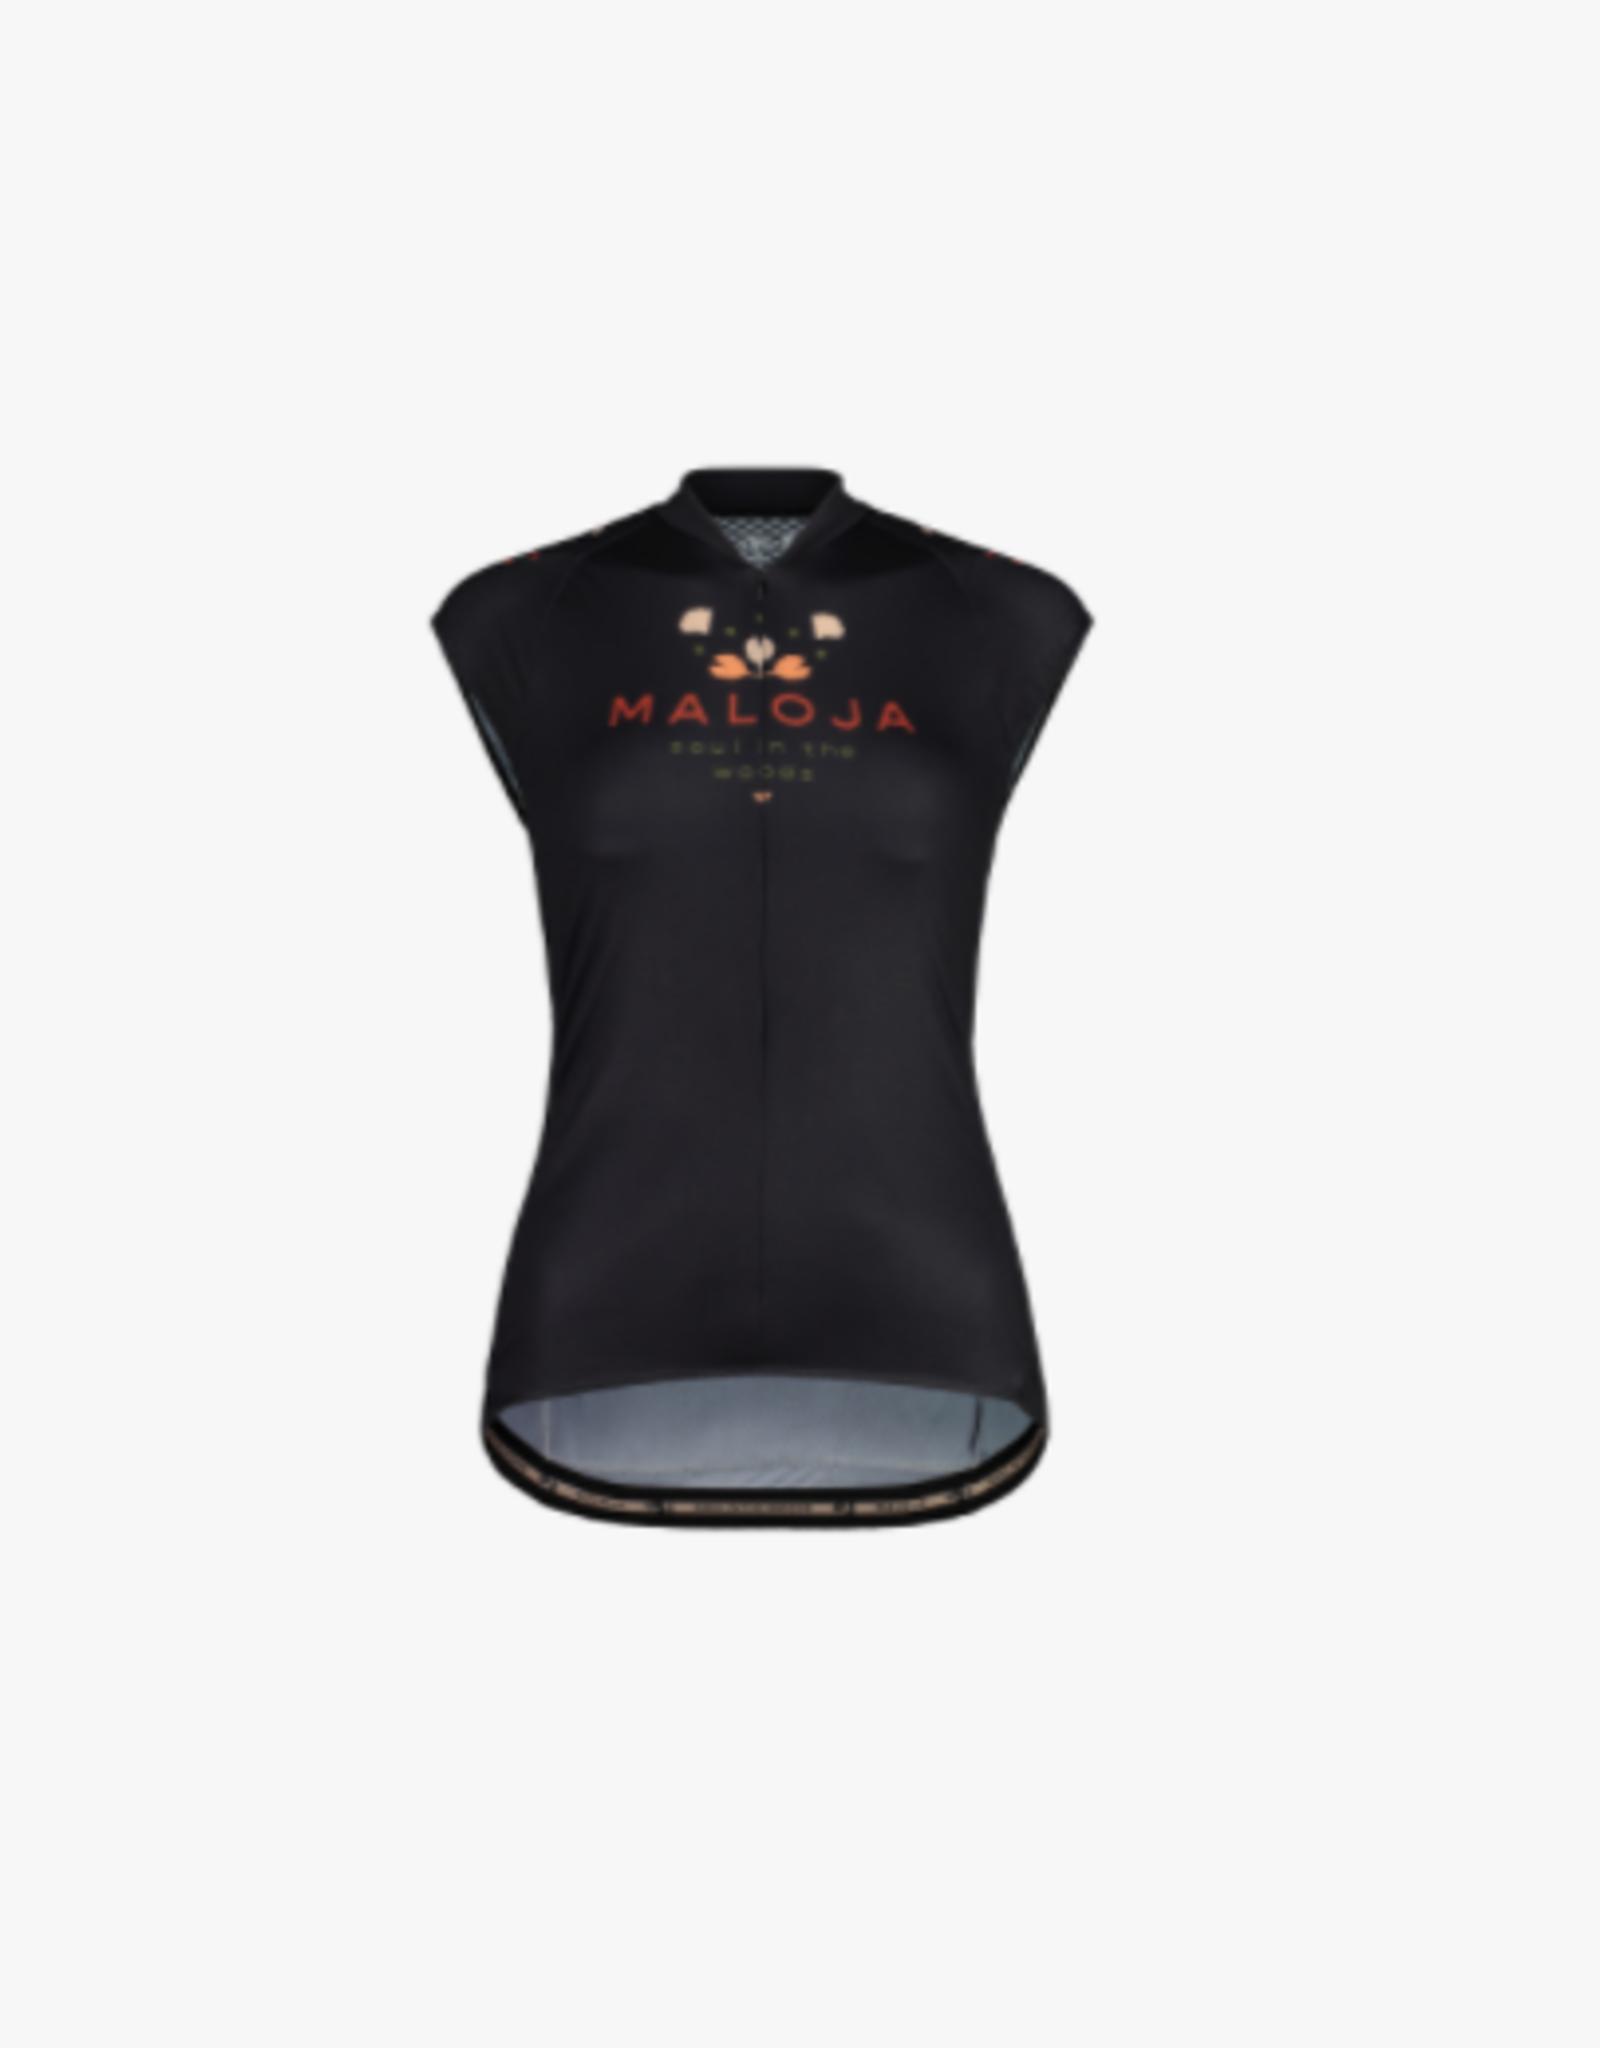 maloja Rubinie mouwloos fiets shirt dames